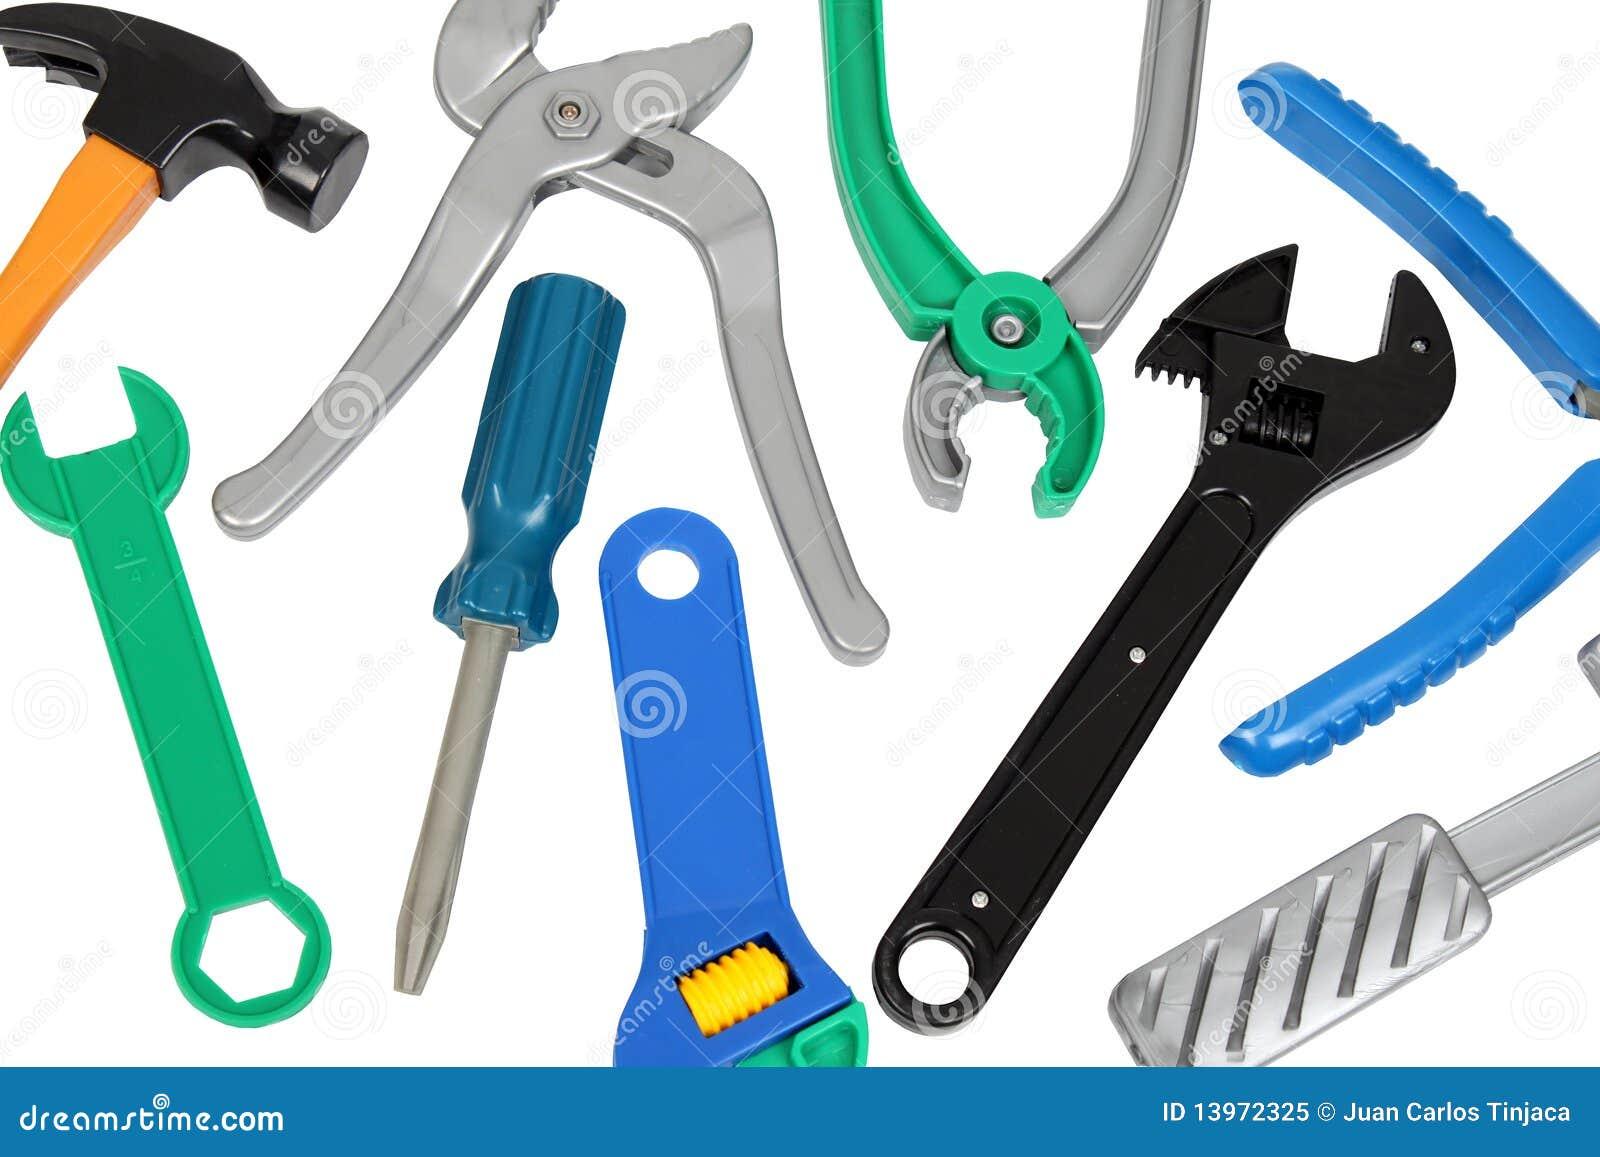 Plastic Toy Tools : Set of plastic toy tools stock image socket